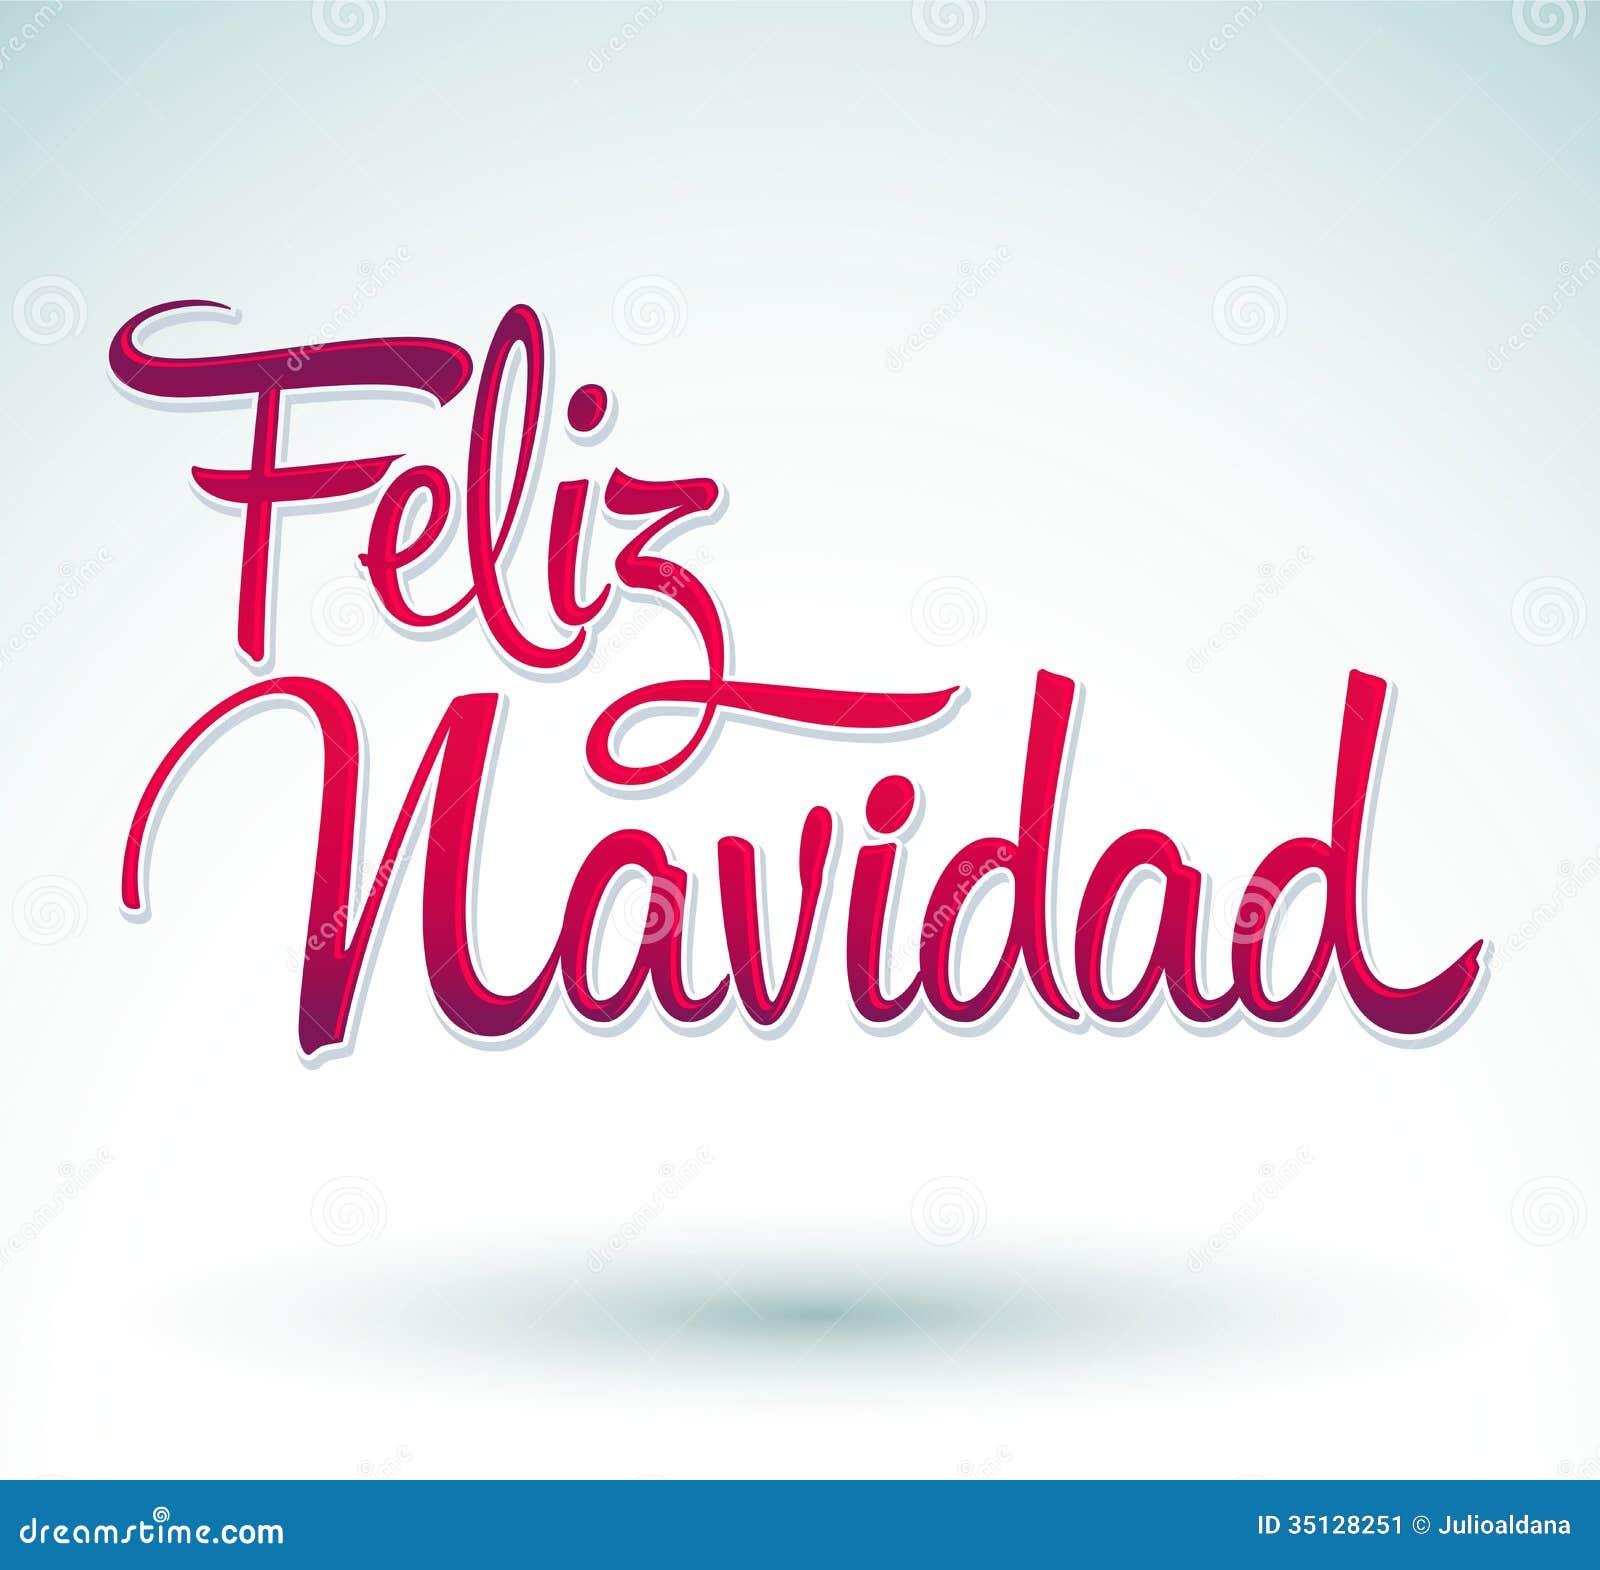 Feliz Navidad - Merry Christmas spanish text - Vector Calligraphic ... Xavier Laflamme Shirt